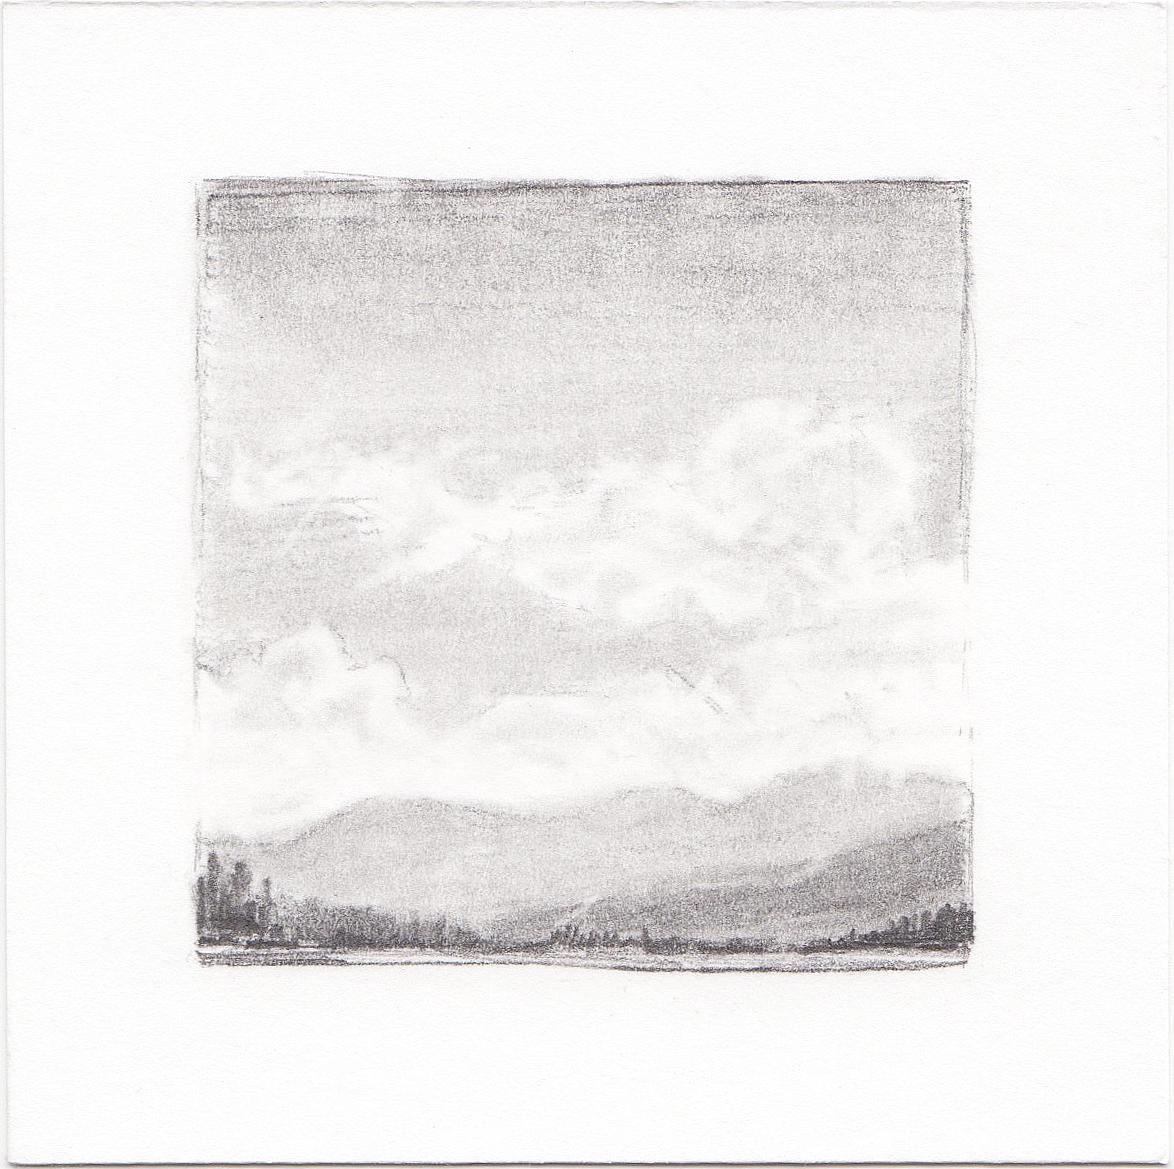 #28 Turquoise Lake, Colorado | 3x3 | graphite